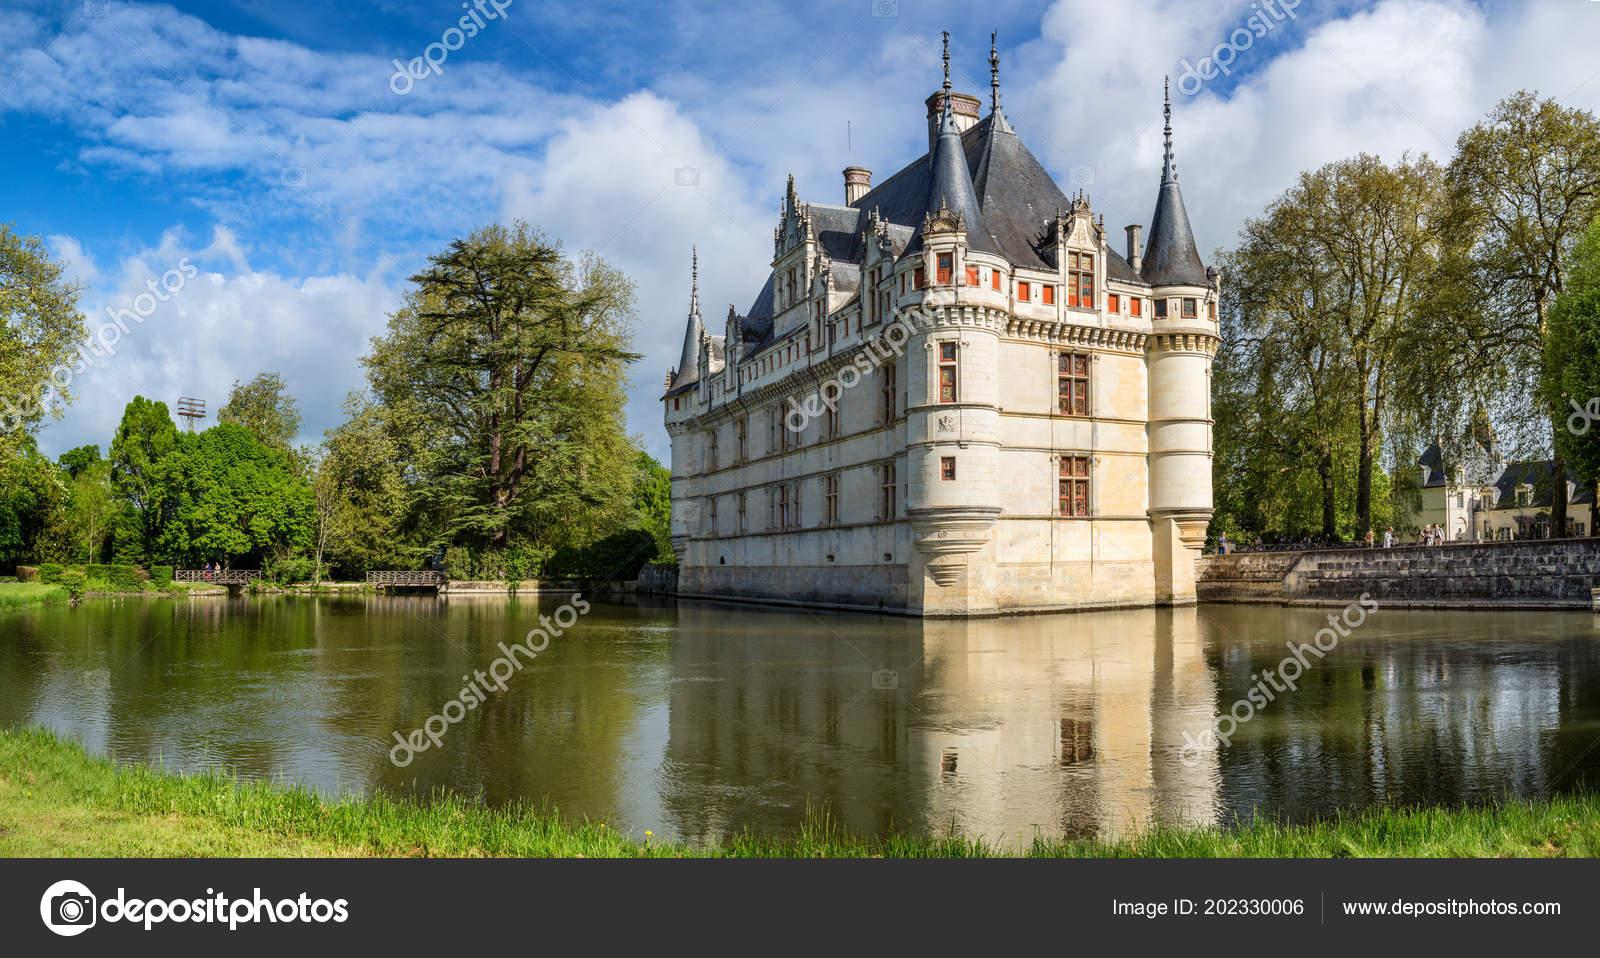 Azay Rideau France May 11th 2013 Beautiful Chateau Azay Rideau